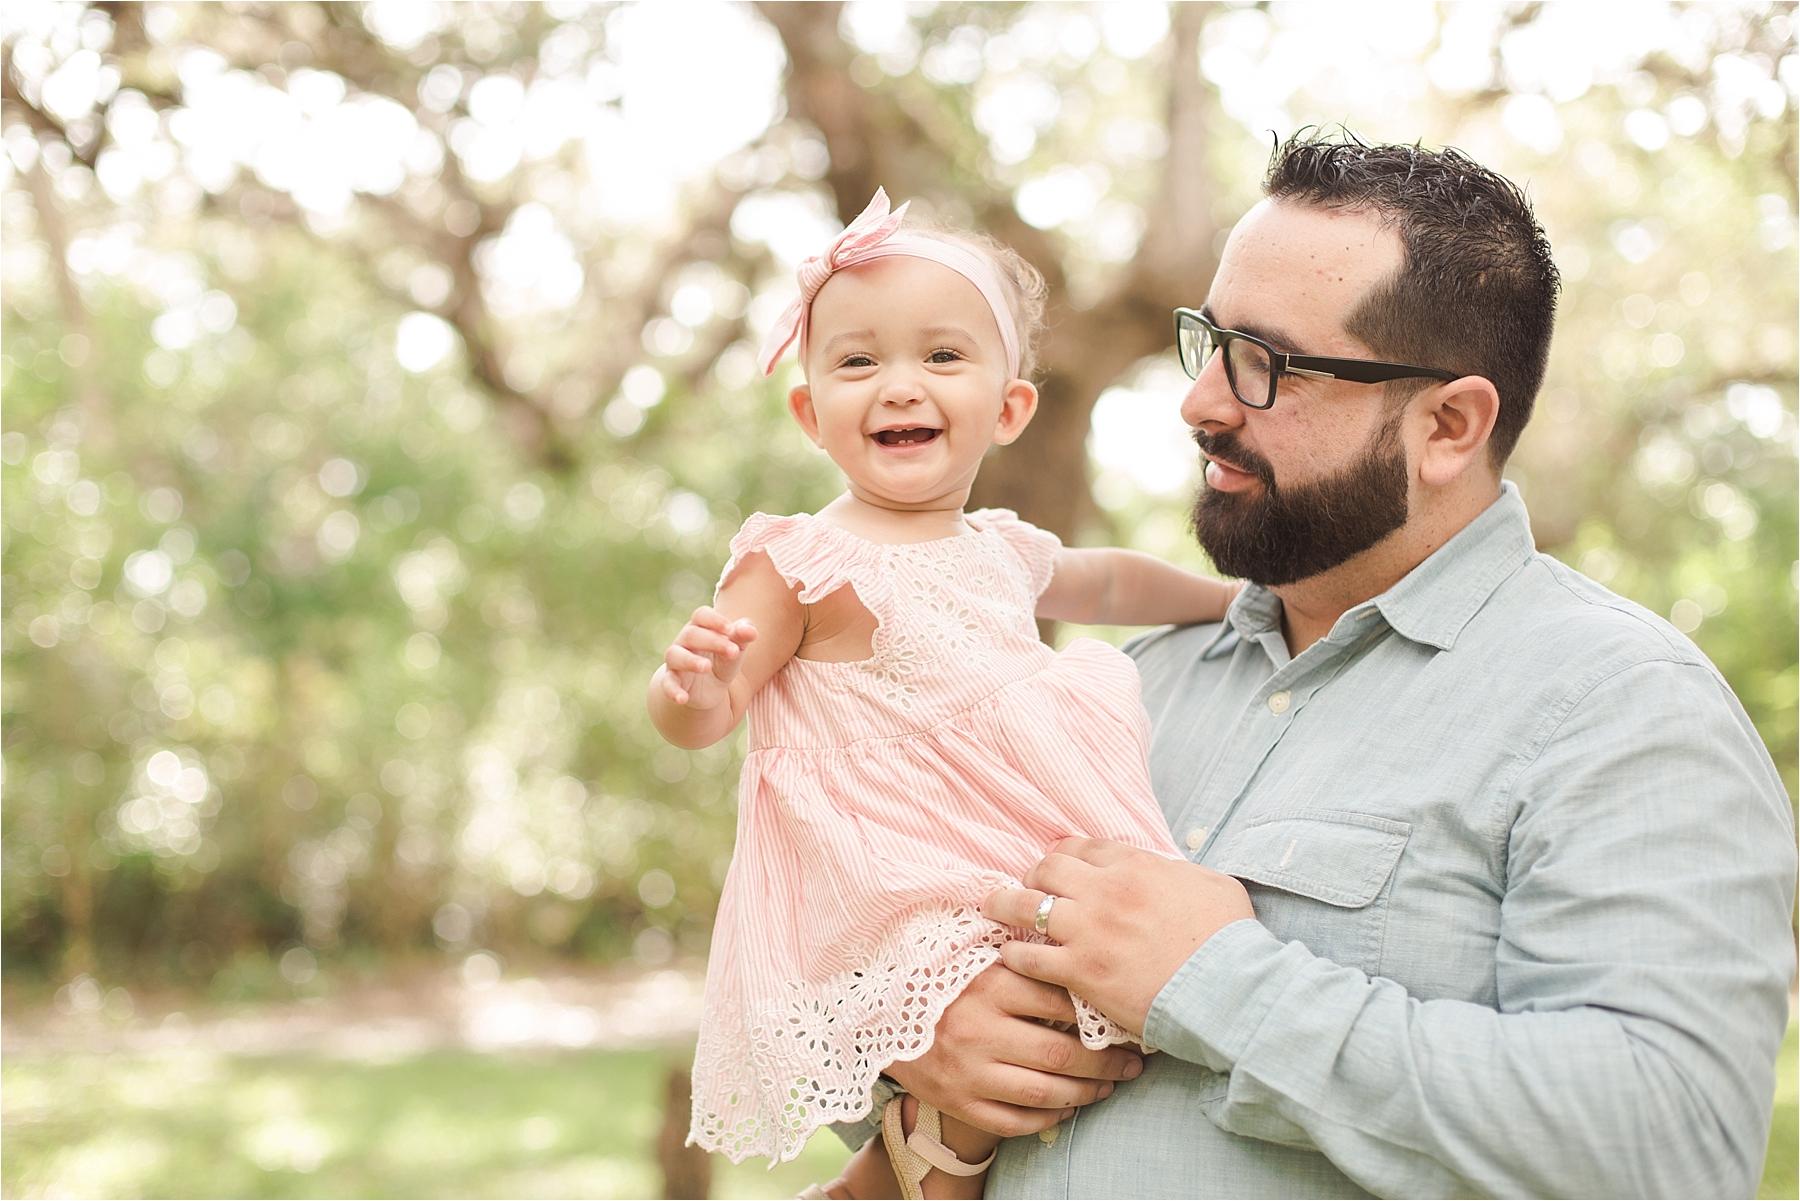 Tree Tops Maternity Family Session